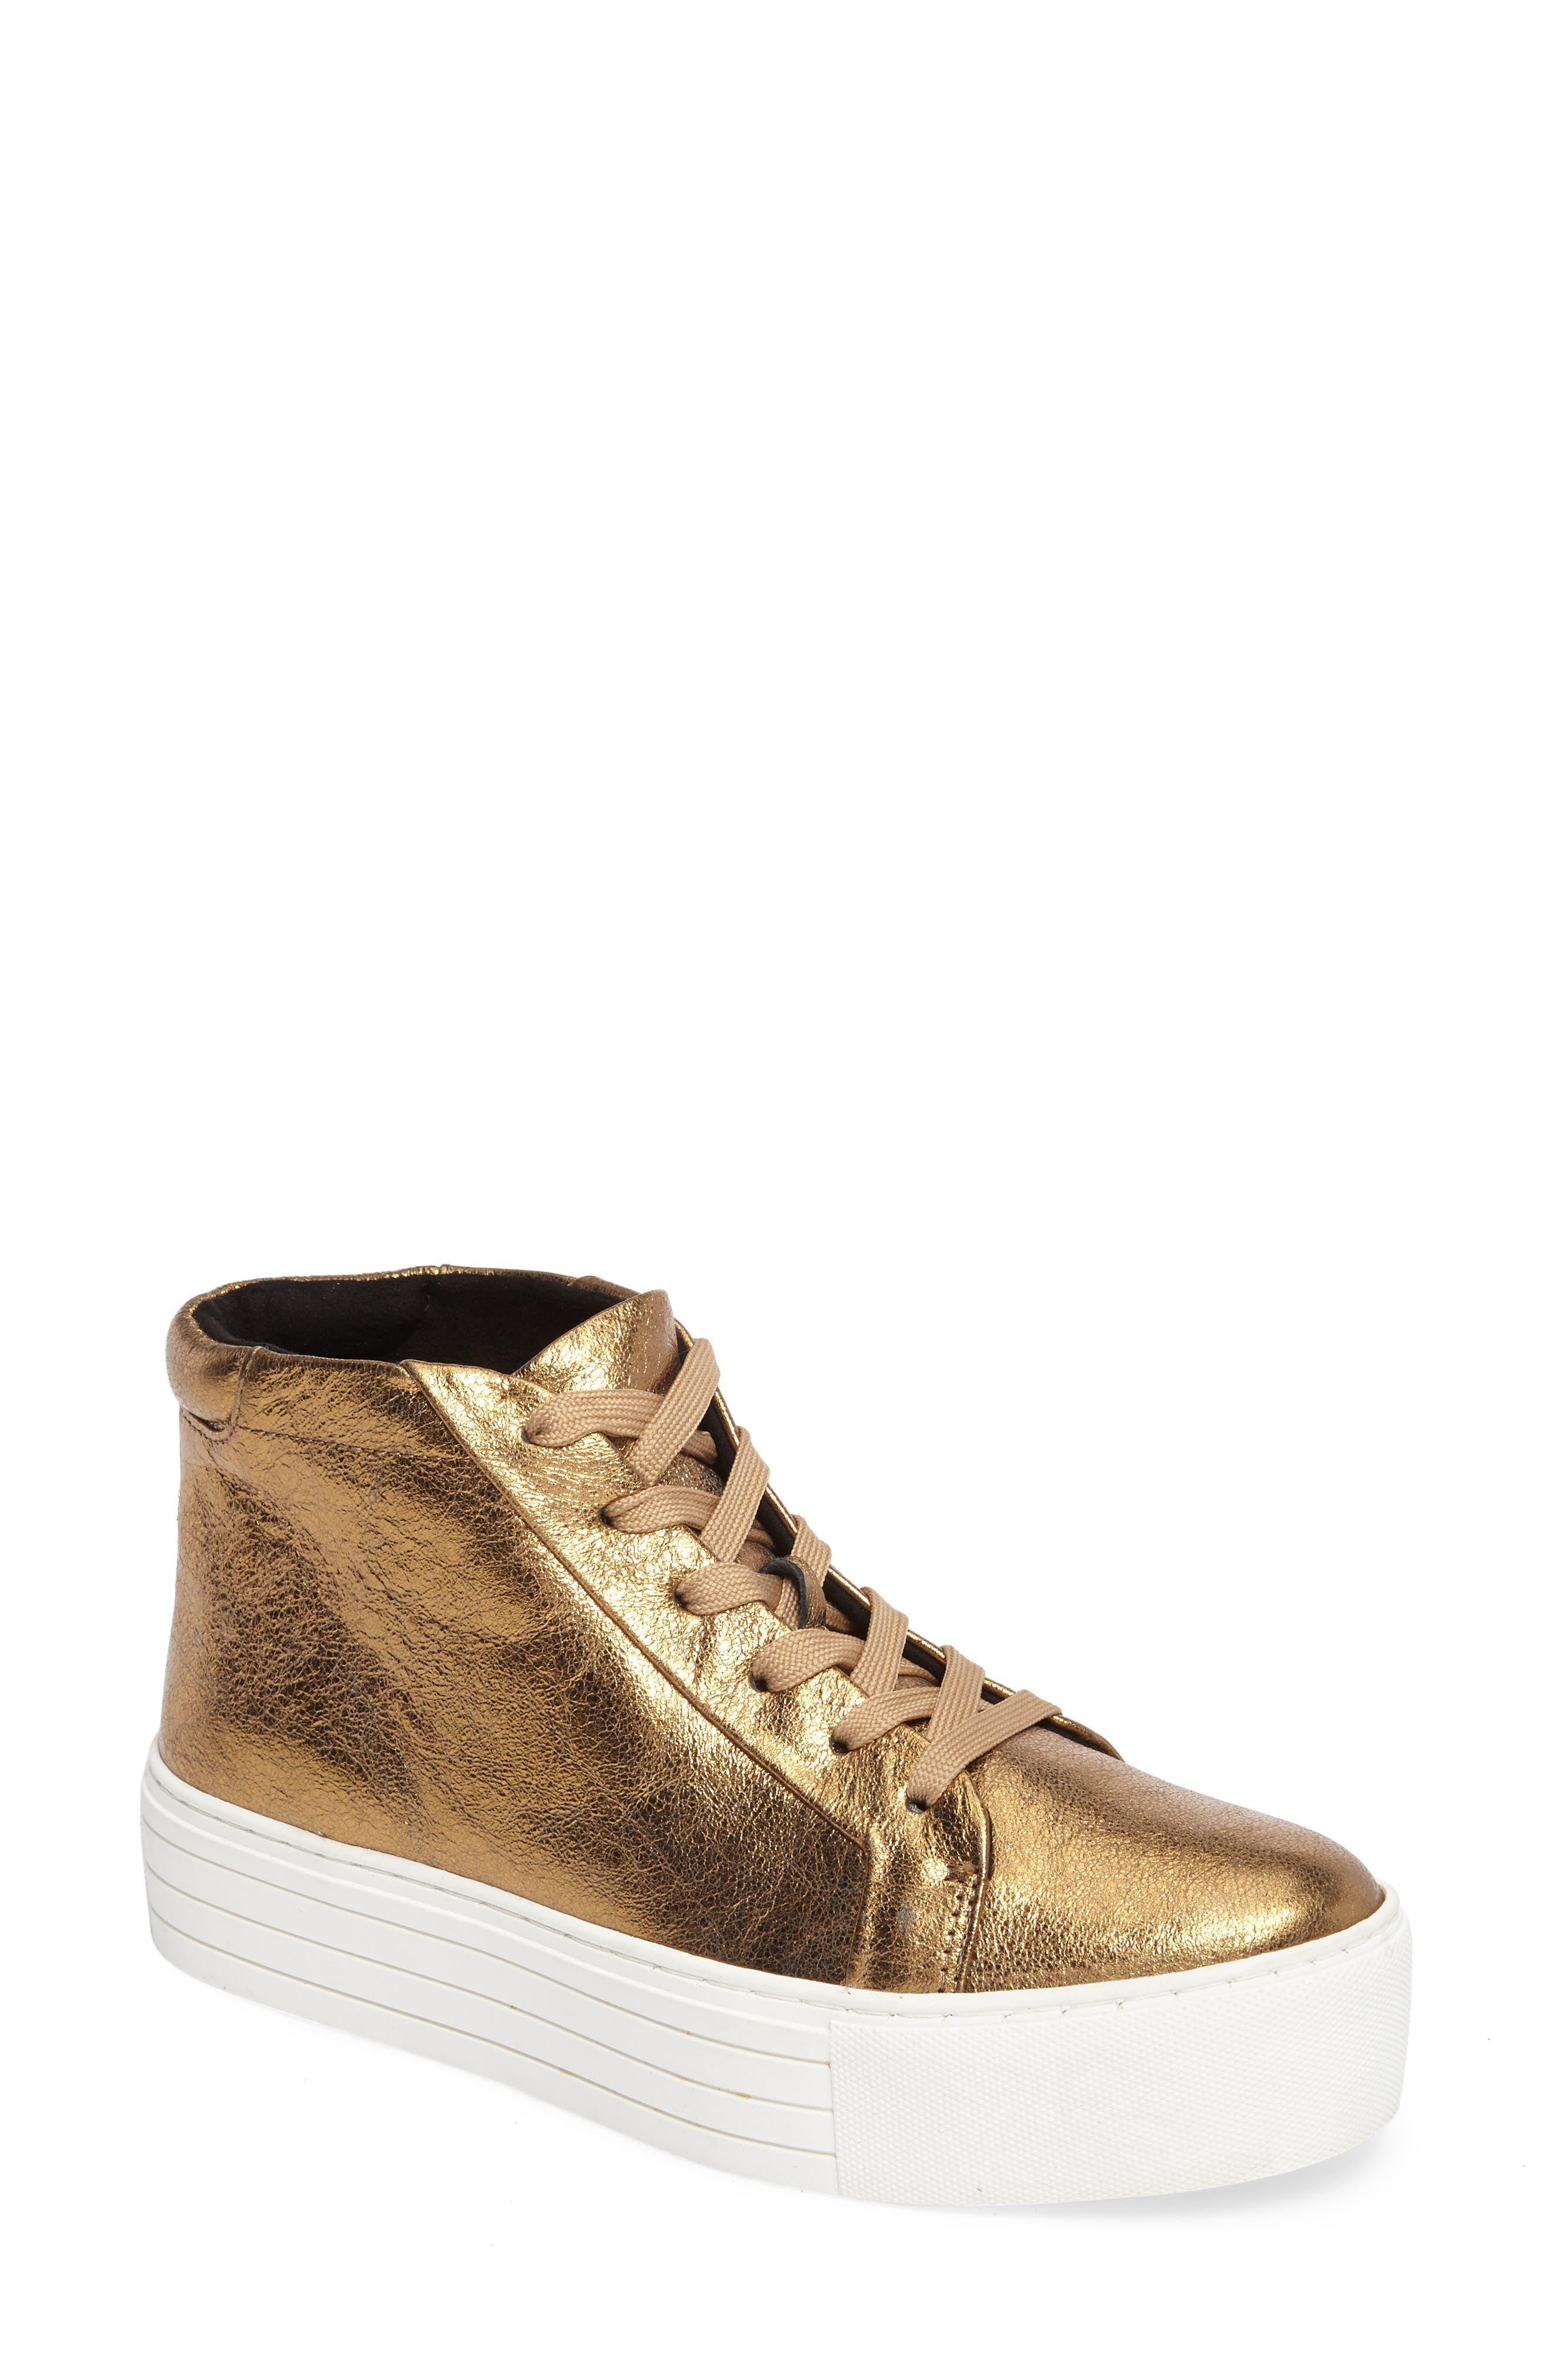 Main Image - Kenneth Cole New York Janette High Top Platform Sneaker (Women)